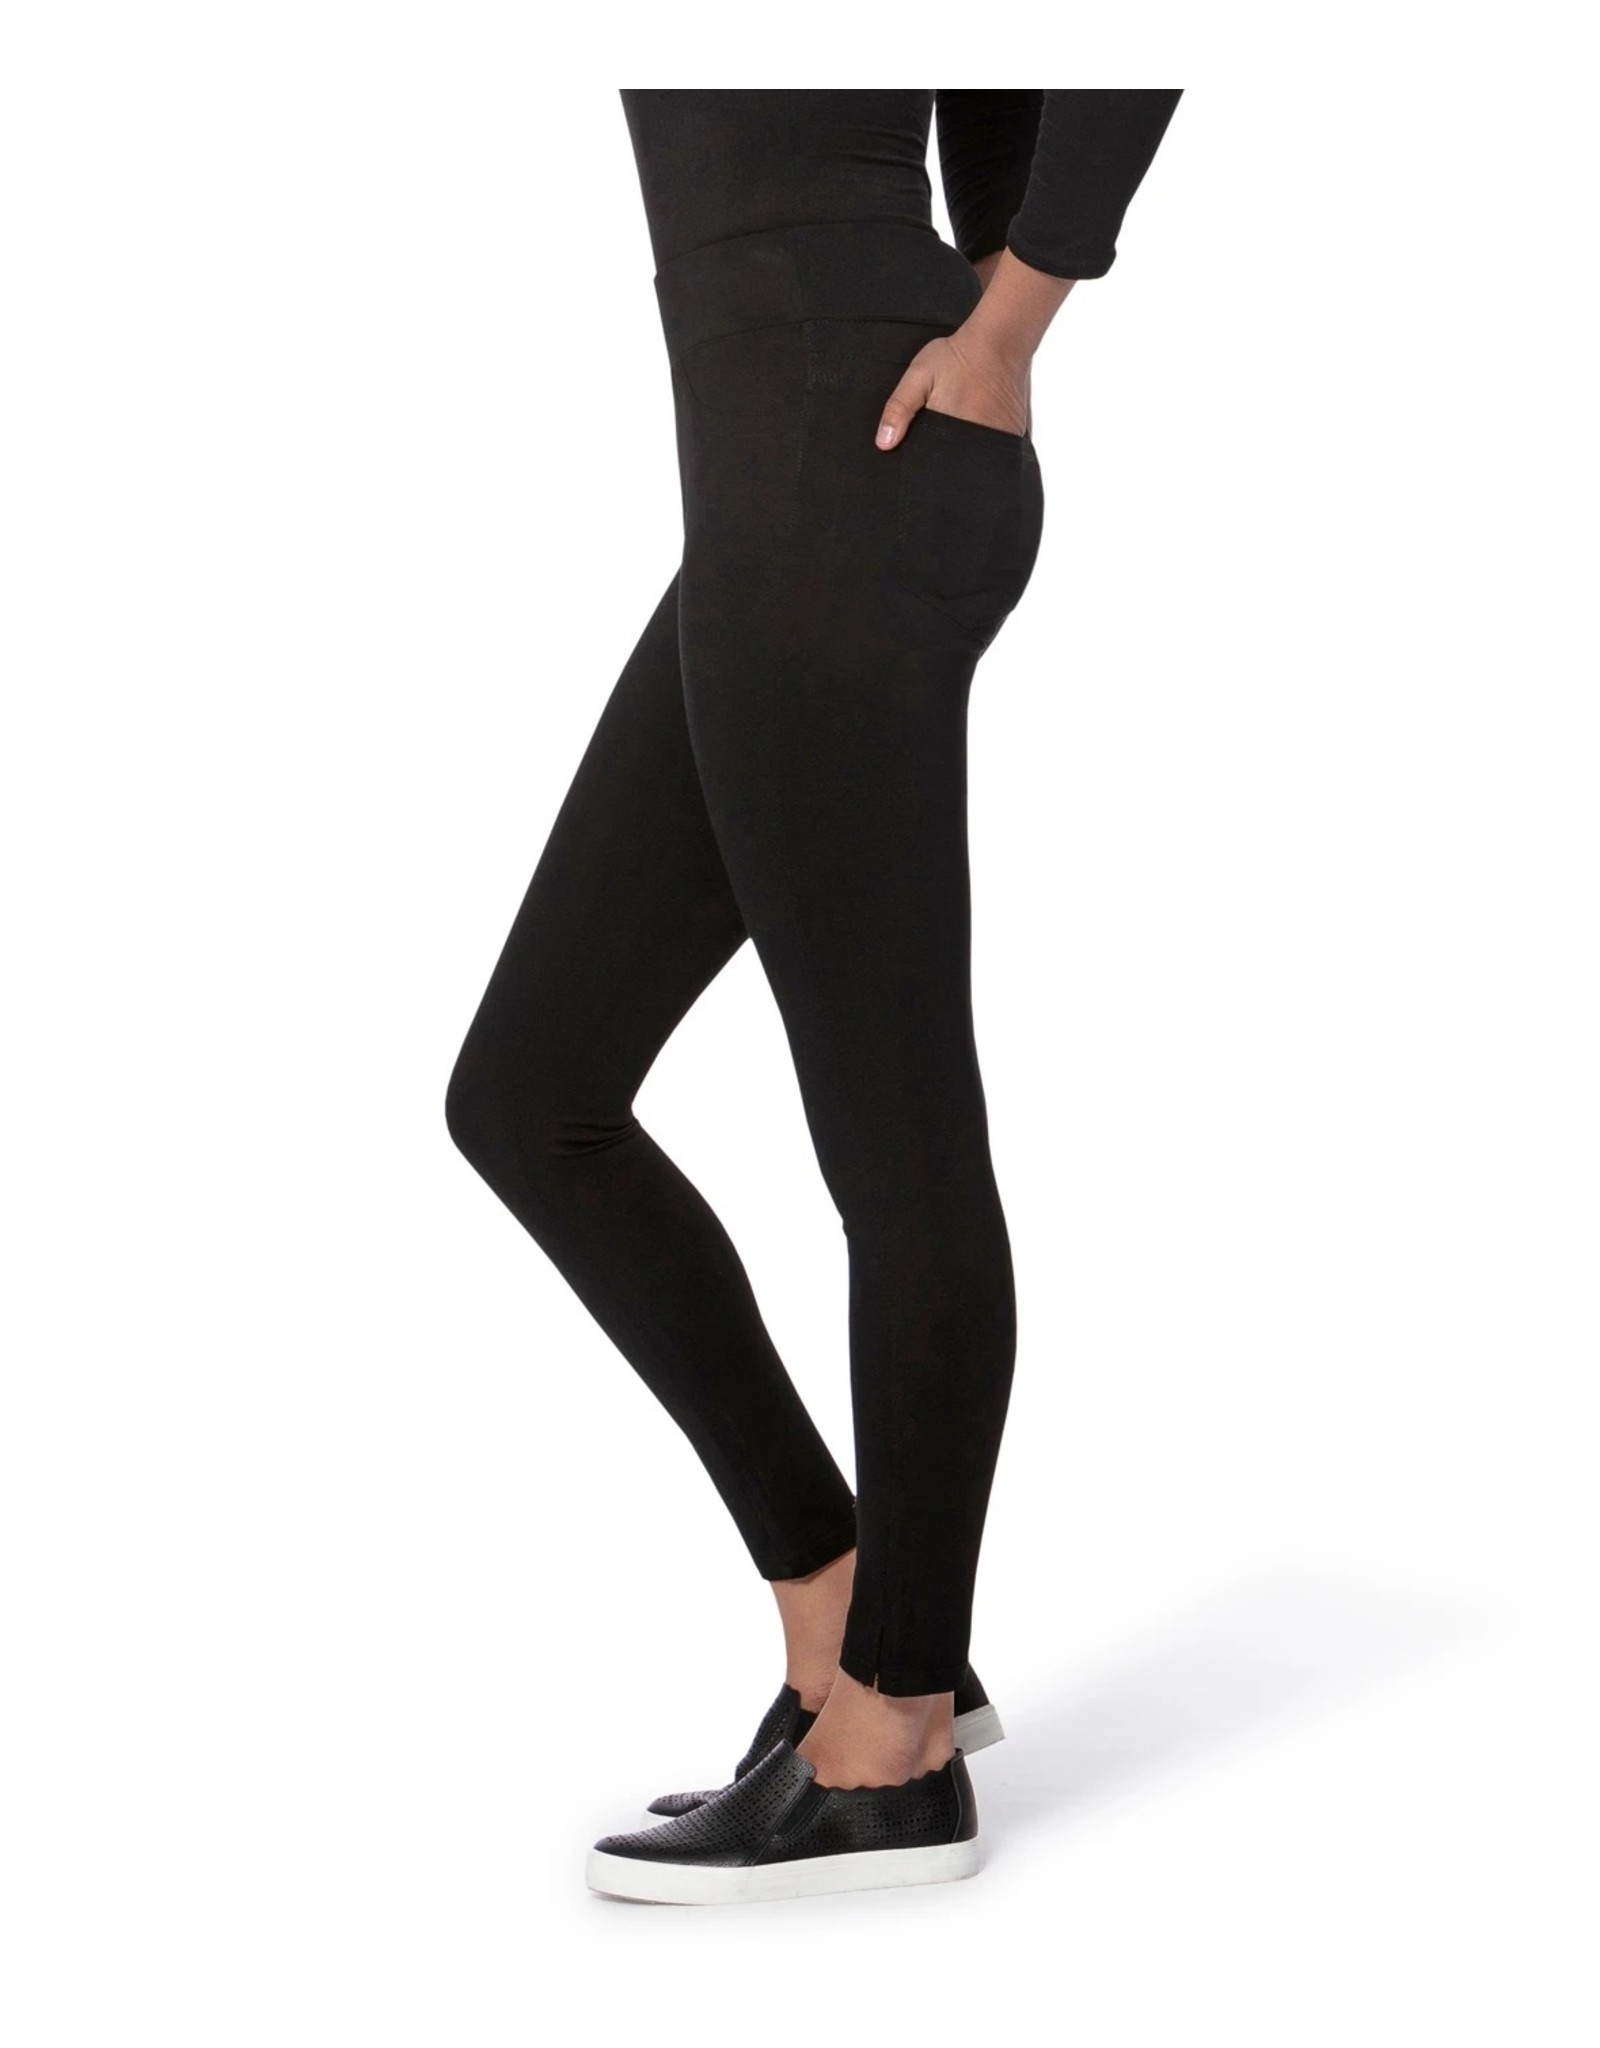 Lola Jeans Ponte Mid Rise Leggings